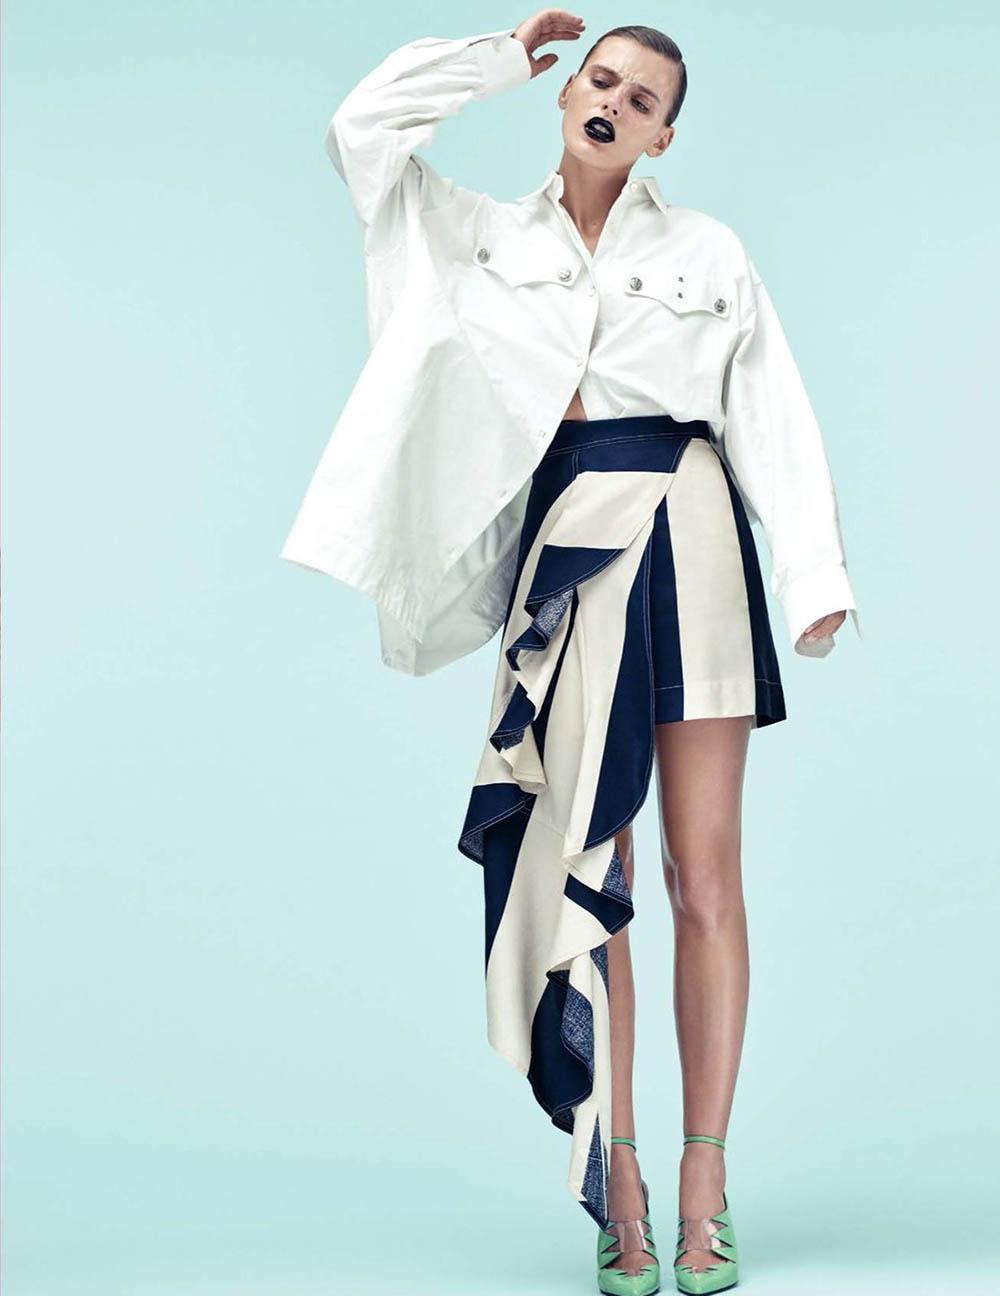 Madison Headrick by Paola Kudacki for Vogue Spain December 2017